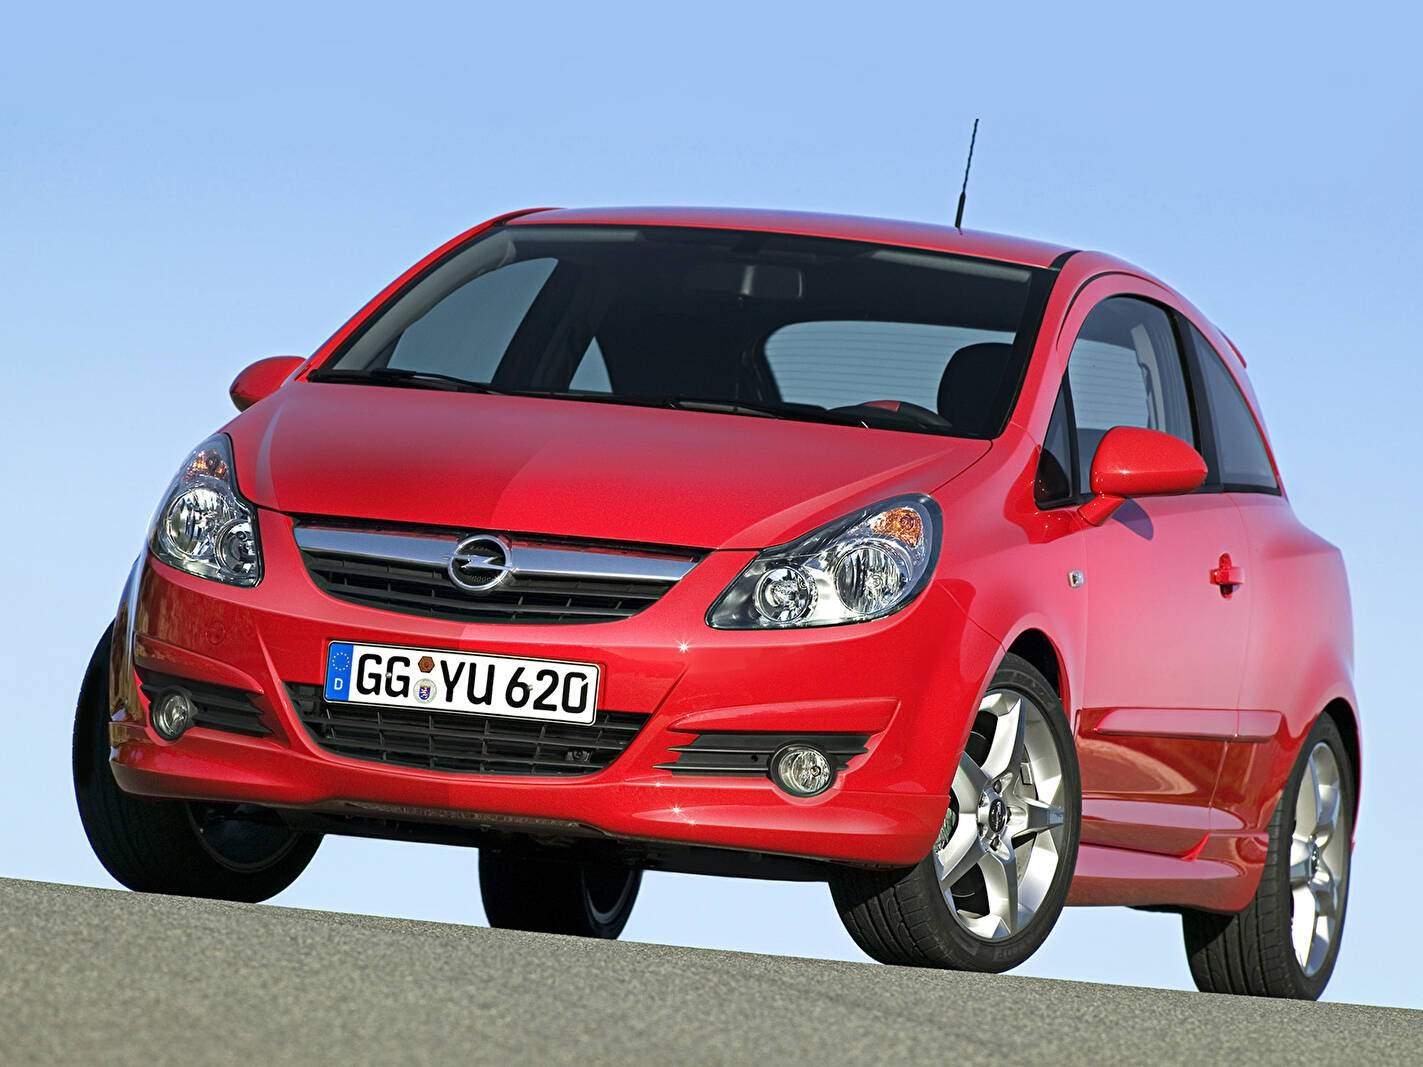 Opel Corsa IV GSi (2007-2012),  ajouté par fox58